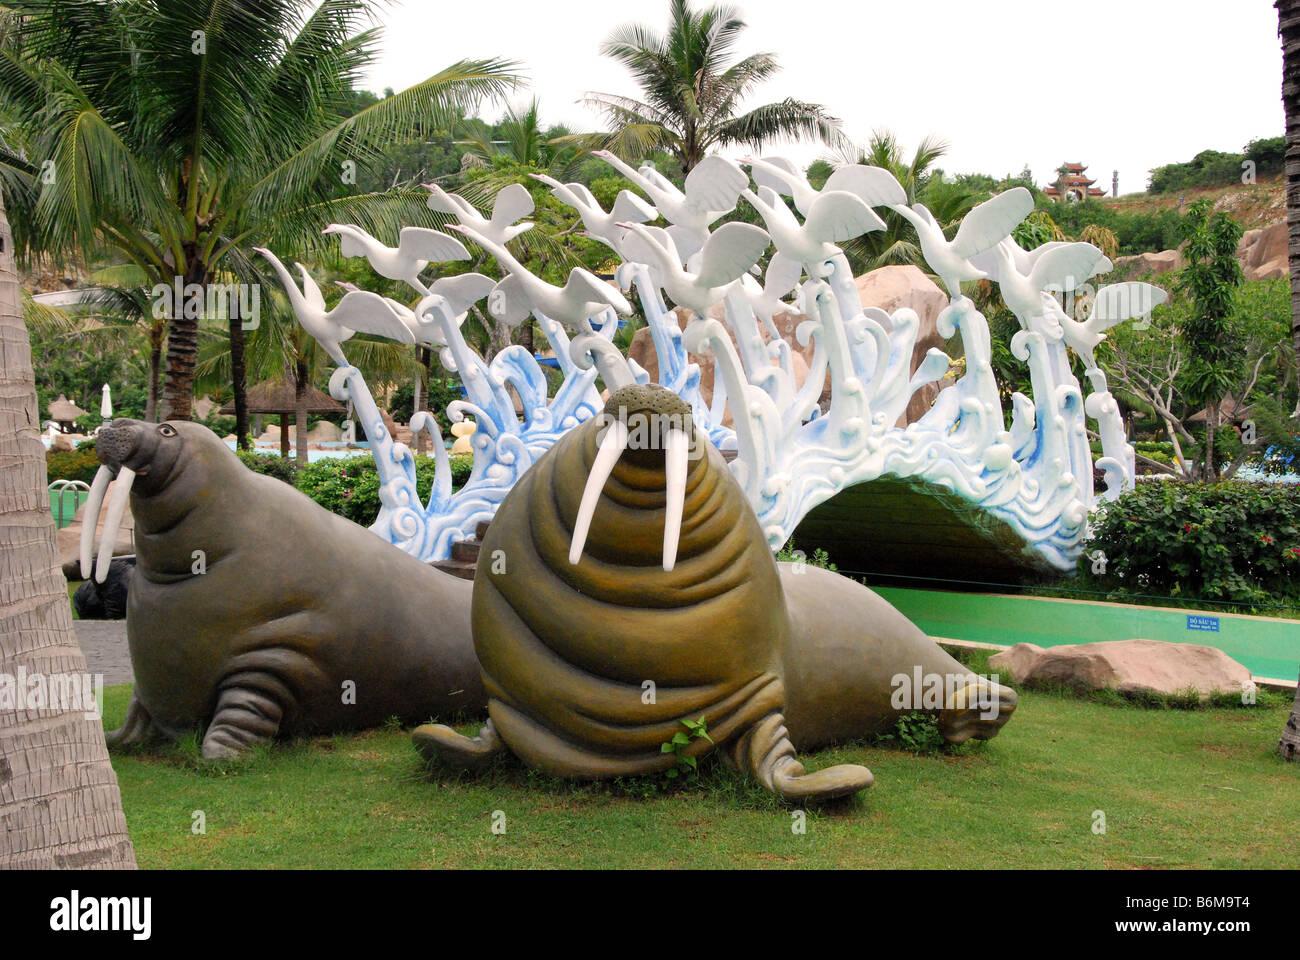 Walrus and fountain, Vin Pearl Amusement Park, Nha Trang, Vietnam - Stock Image